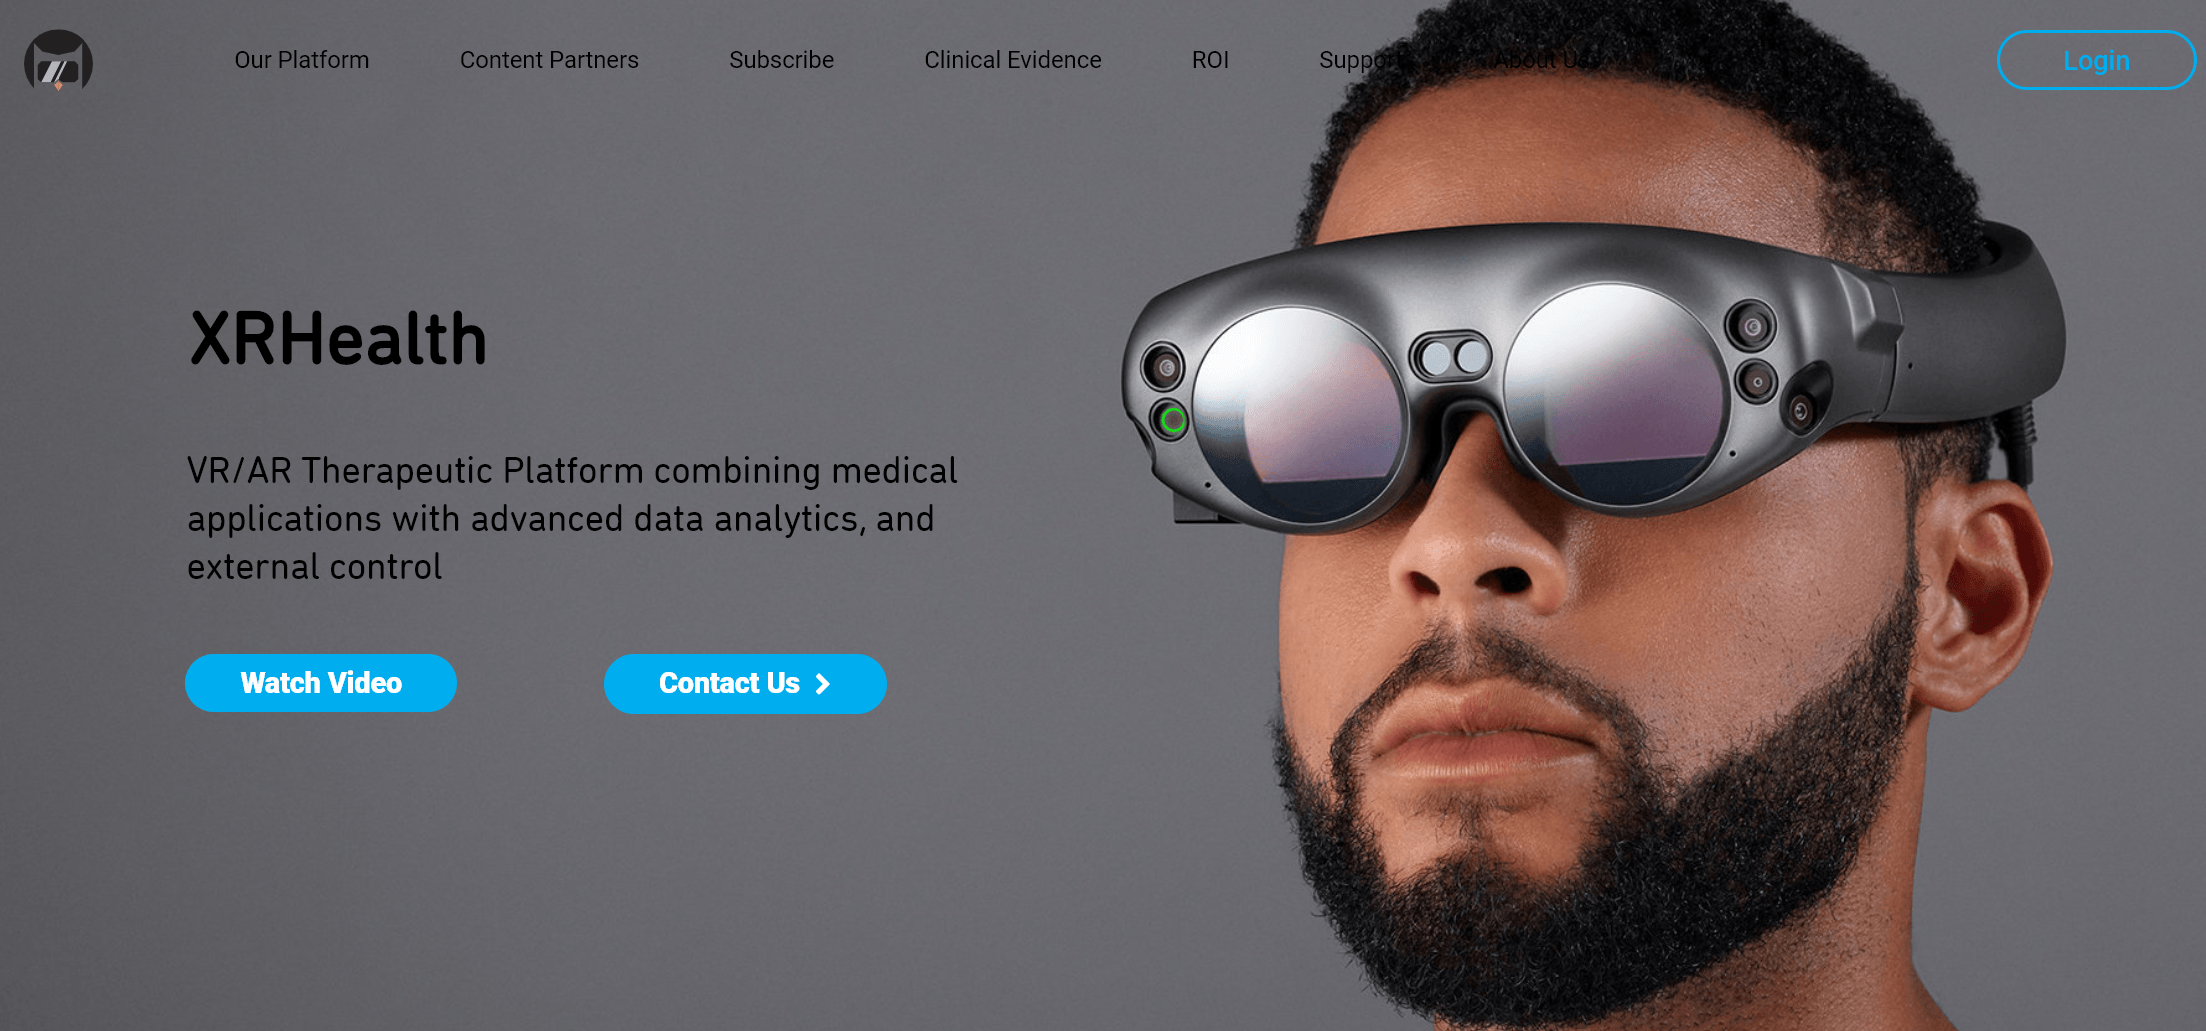 XRHealth, Allscripts Partner to Integrate VR/AR Platforms, Leveraging Open APIs